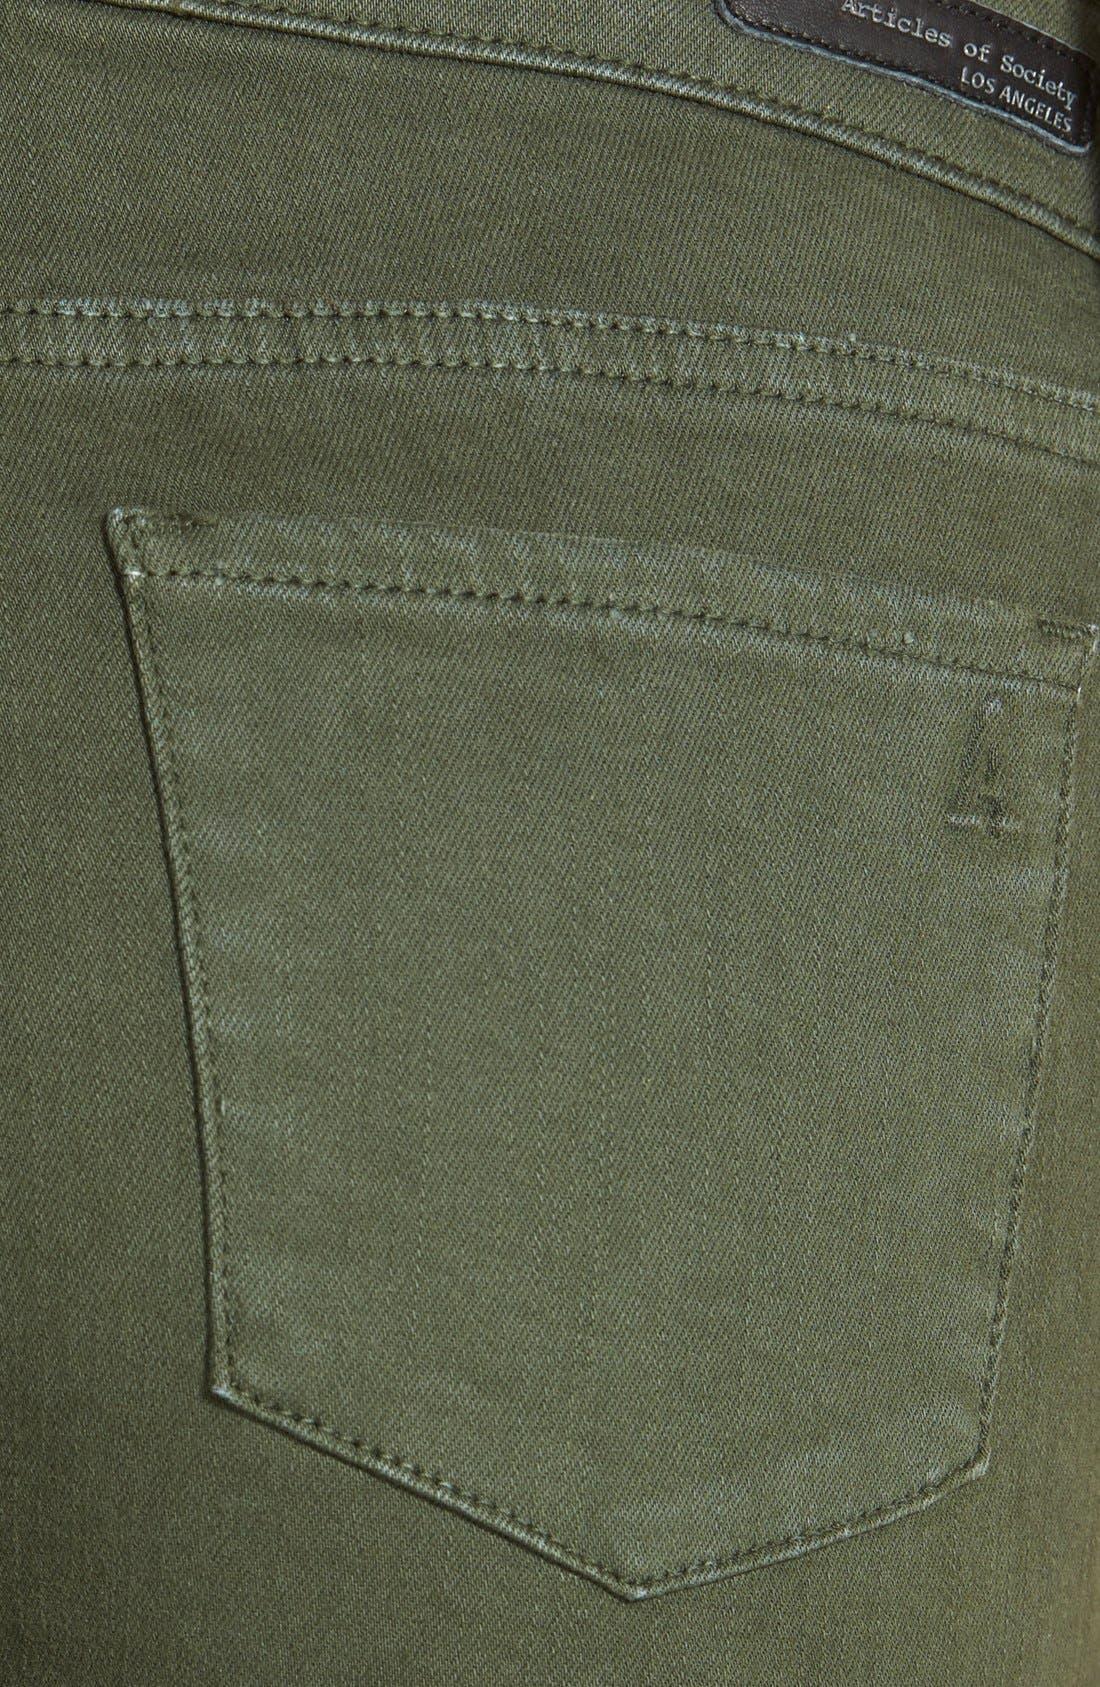 Alternate Image 3  - Articles of Society 'Cindy' Overdye Skinny Jeans (Olive)